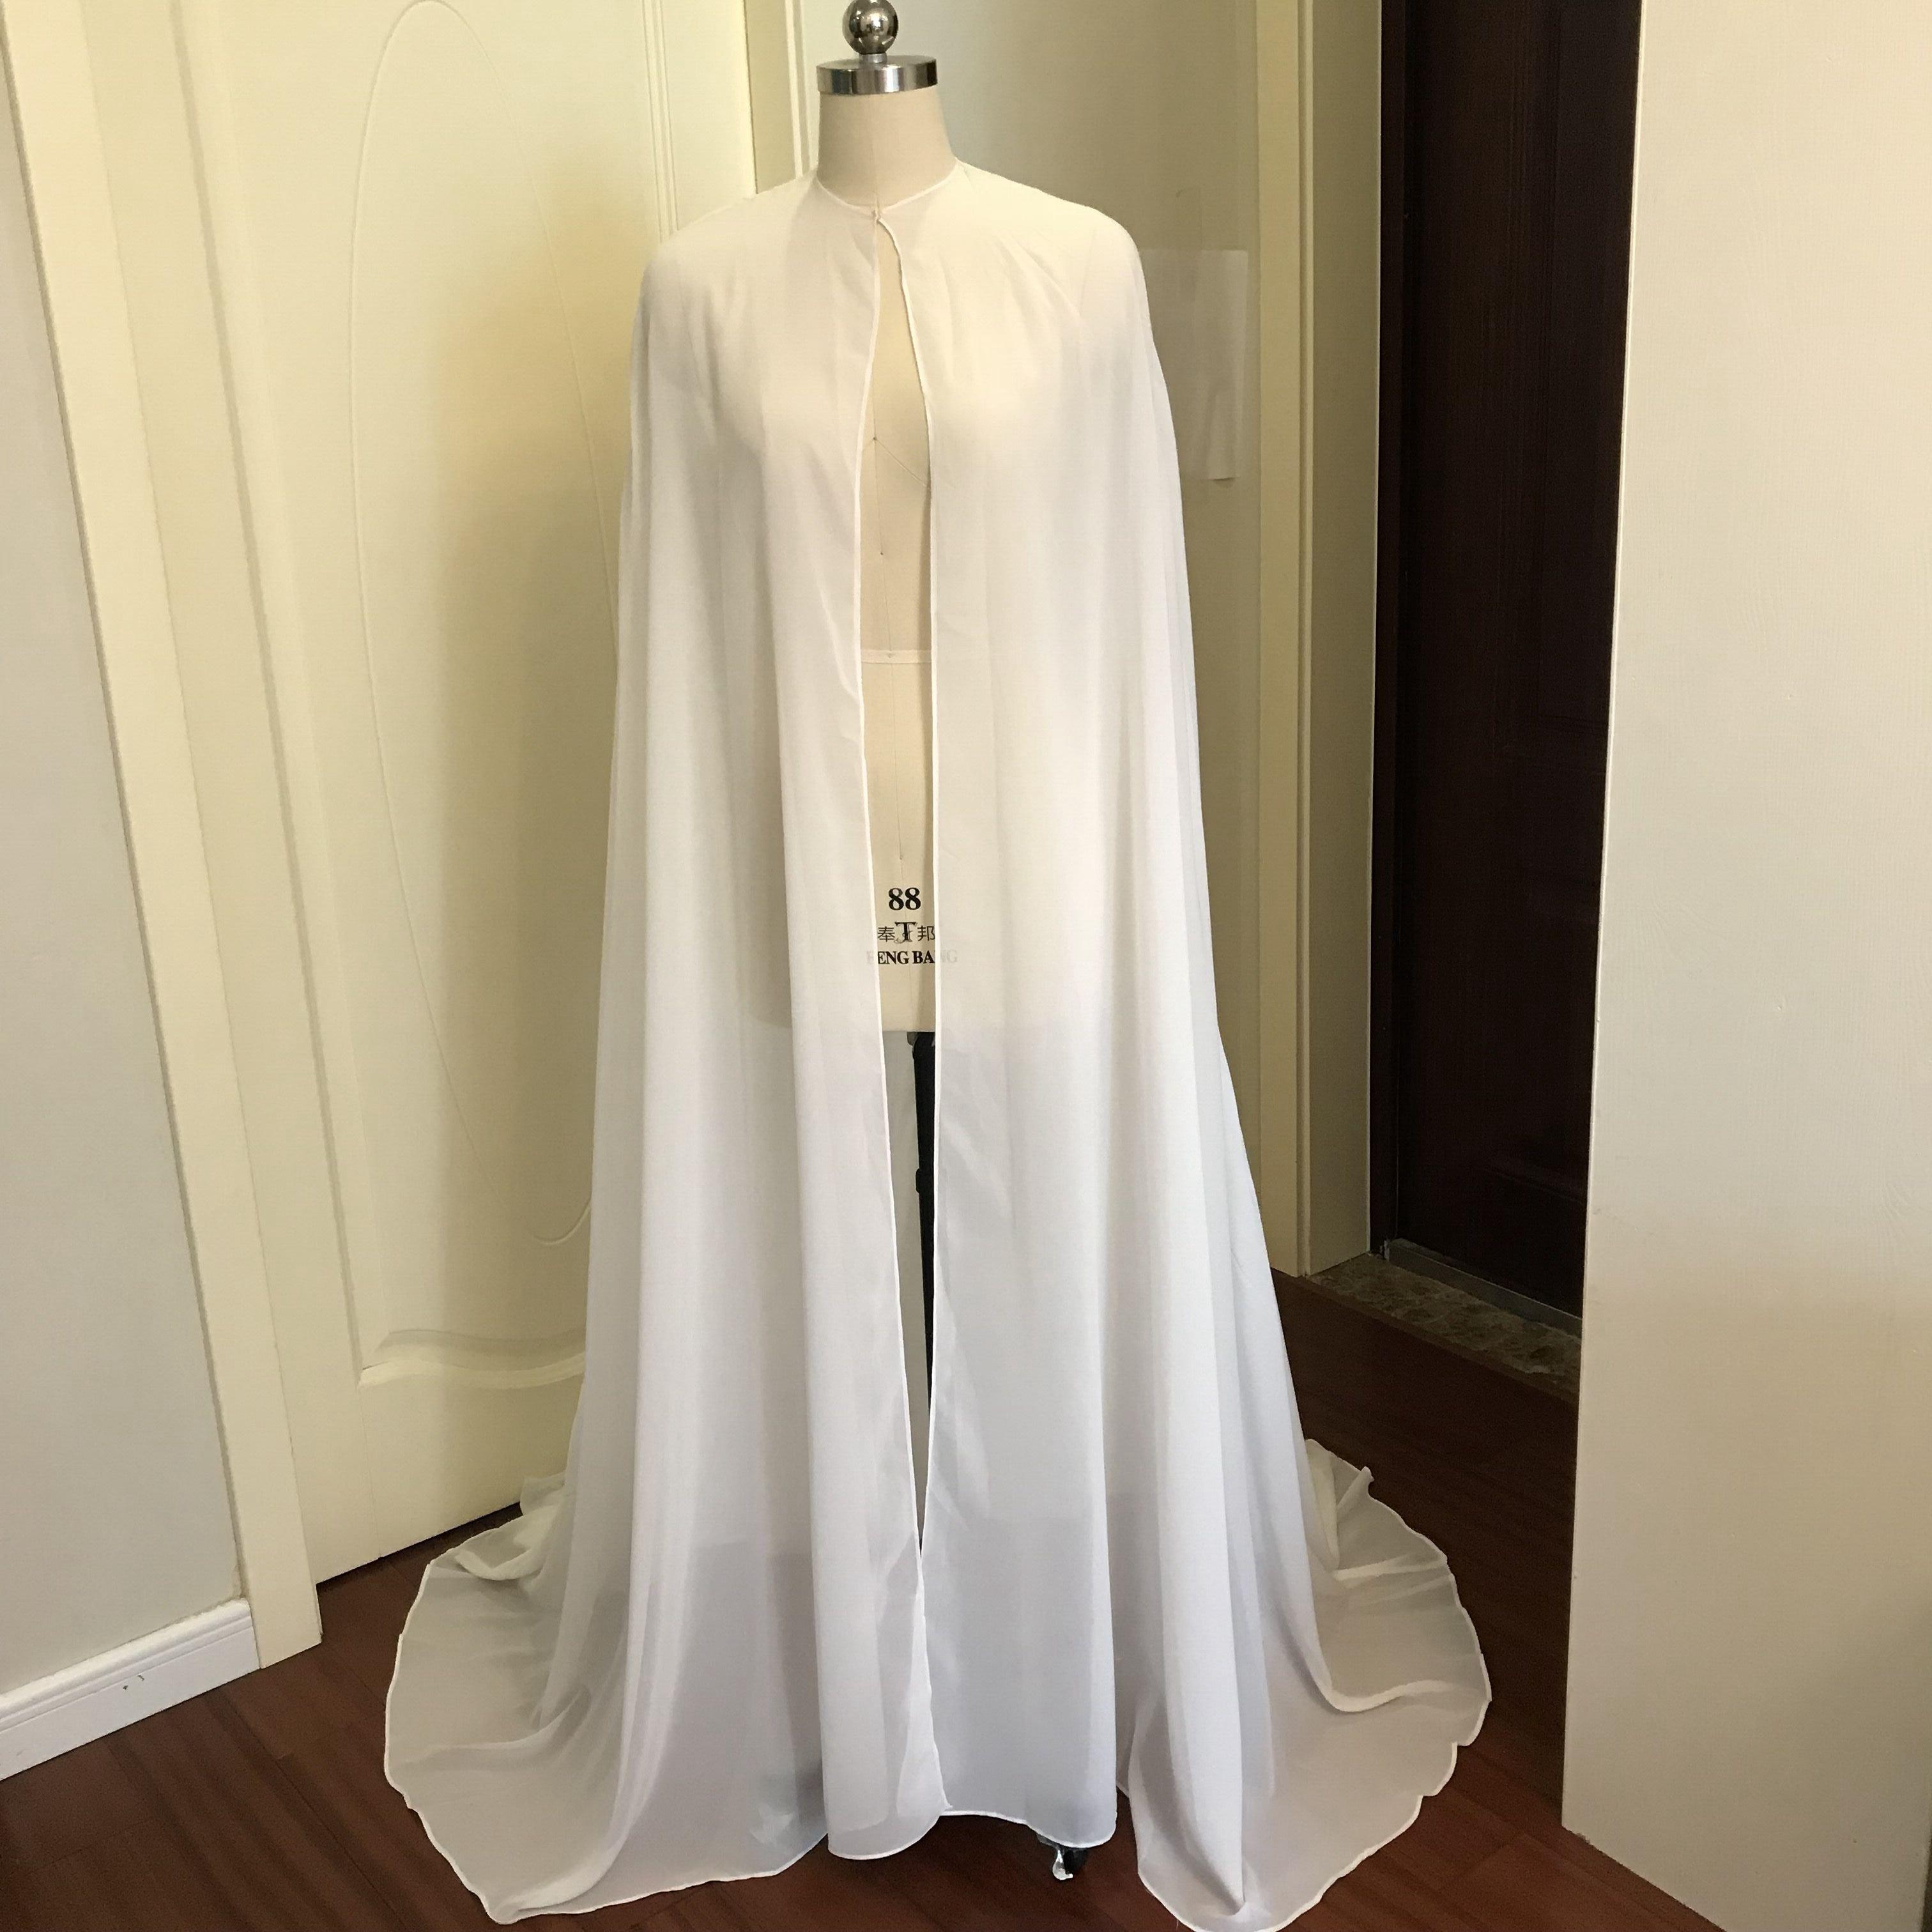 Women Bolero Long Wraps Elegant White Sheer Summer Formal Evening Dresses Cape Chiffon Cheap Cloaks Bridal Wedding Party Shawls in Wedding Jackets Wrap from Weddings Events